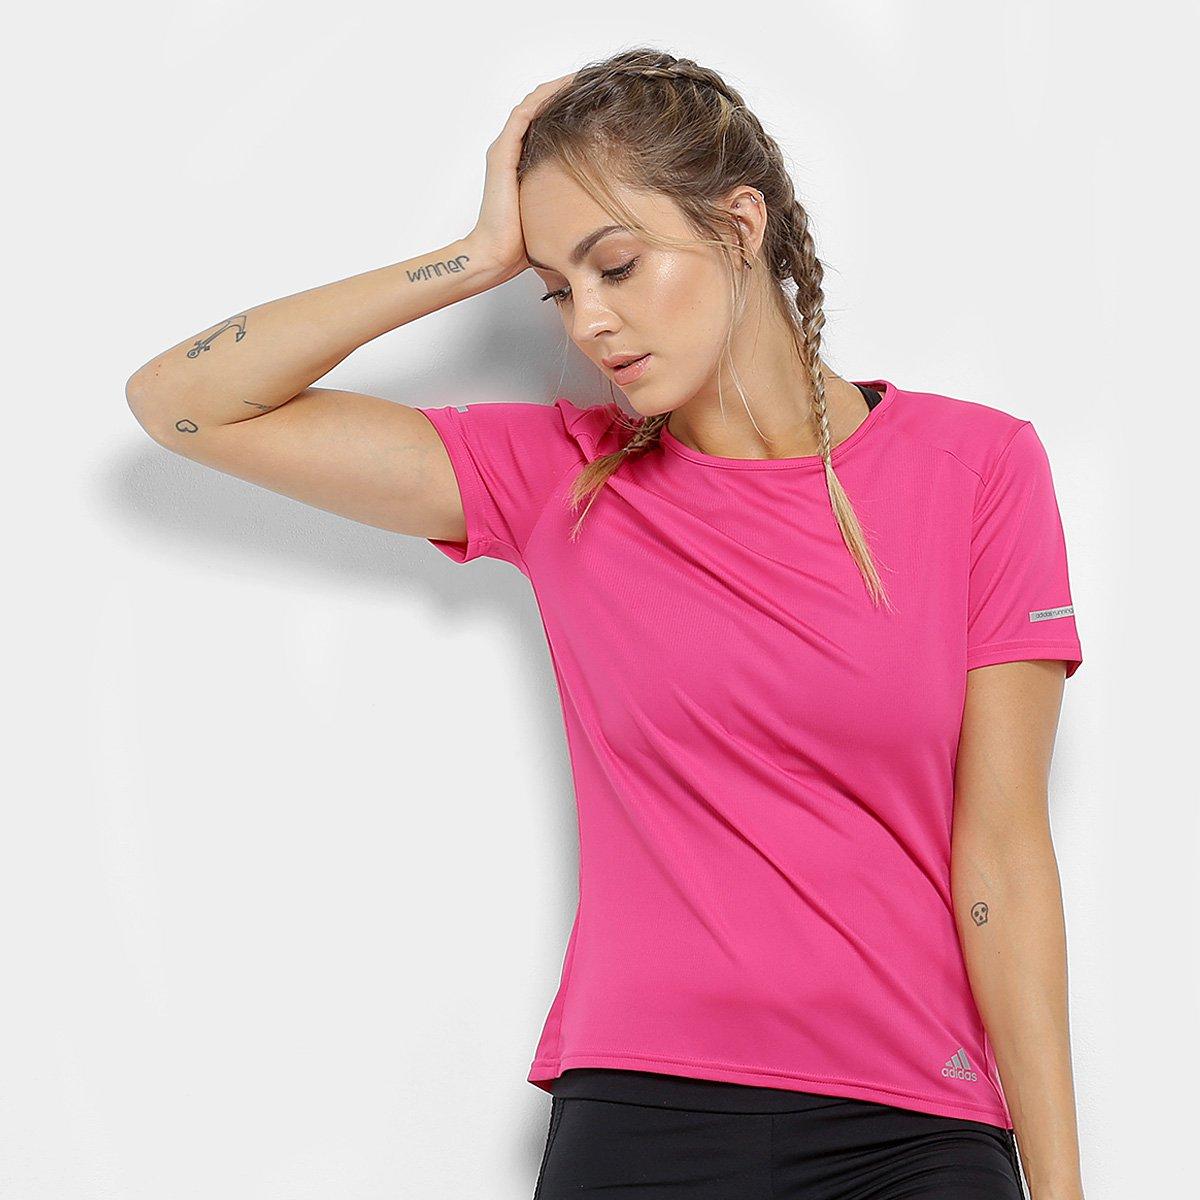 0bd0fa0e11c Camiseta Adidas Run Feminina - Tam  G - Shopping TudoAzul